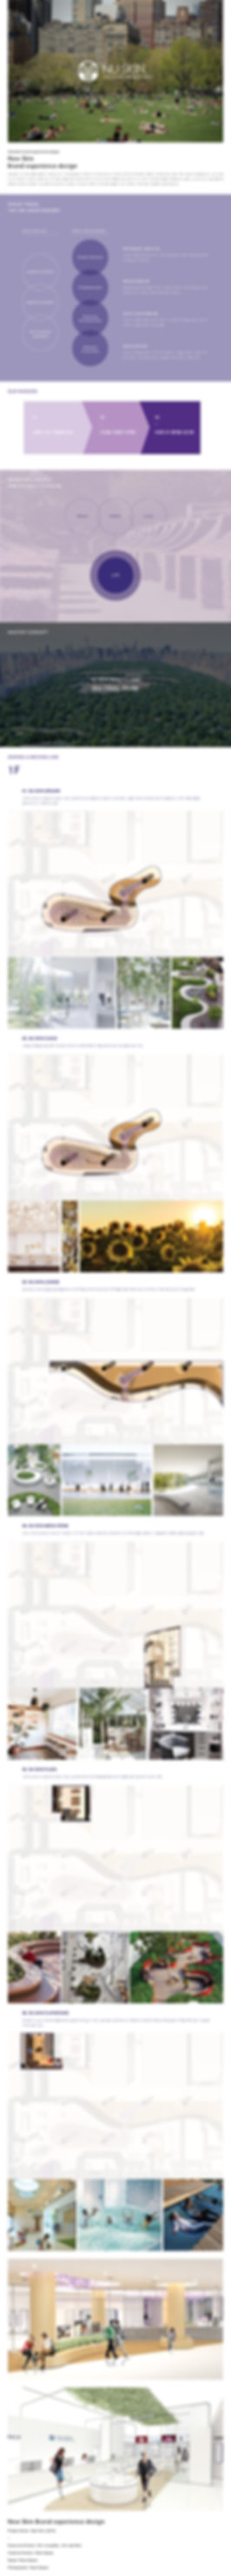 web_뉴스킨-홈페이지-업로드.jpg